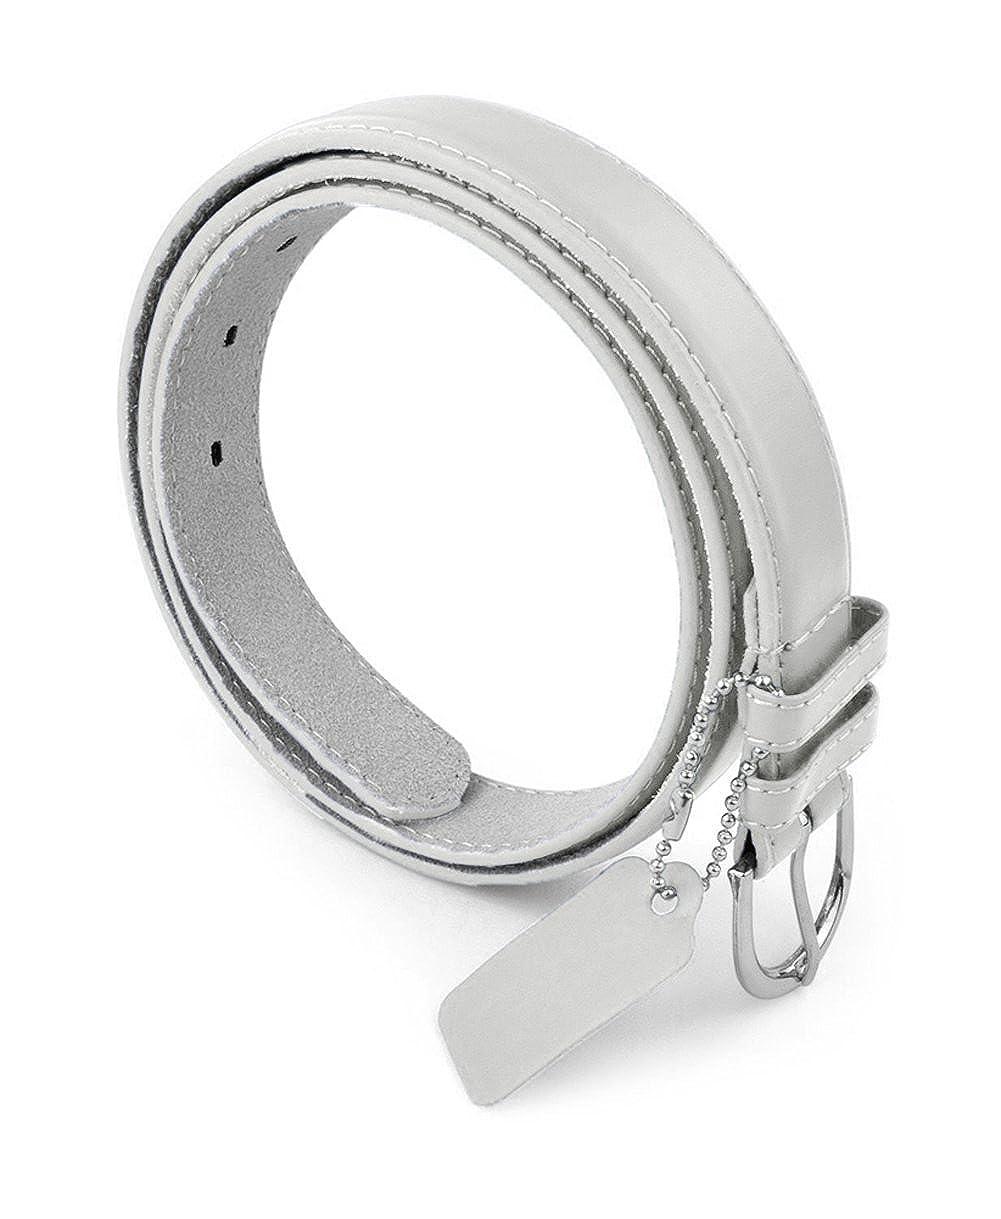 Chic Dress Belt Bonded...